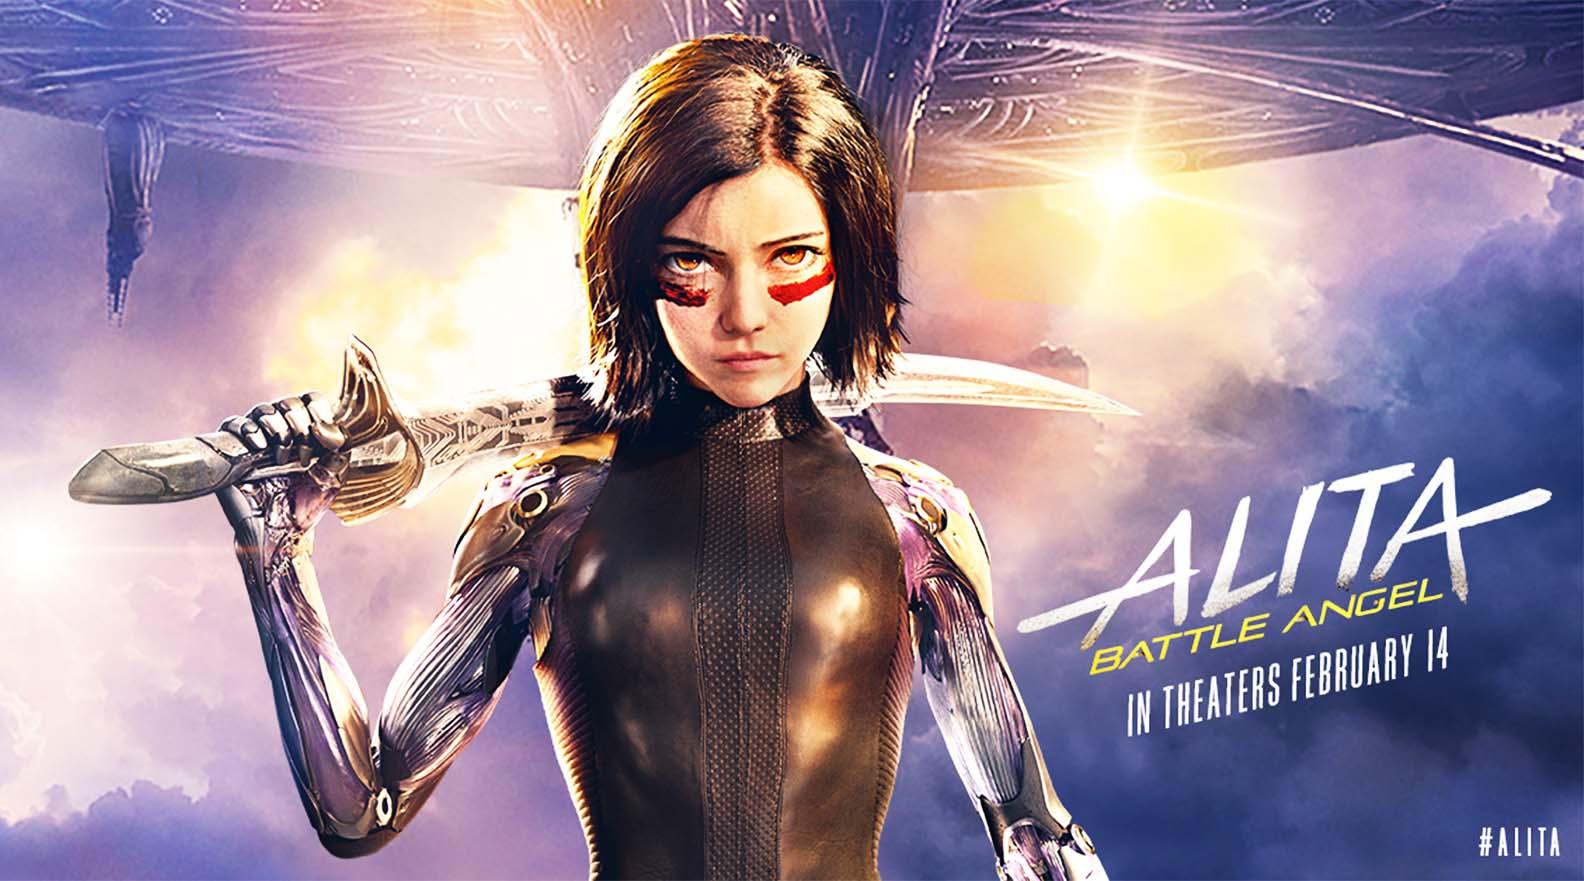 Alita Battle Angel Torrent Movie Download 2019